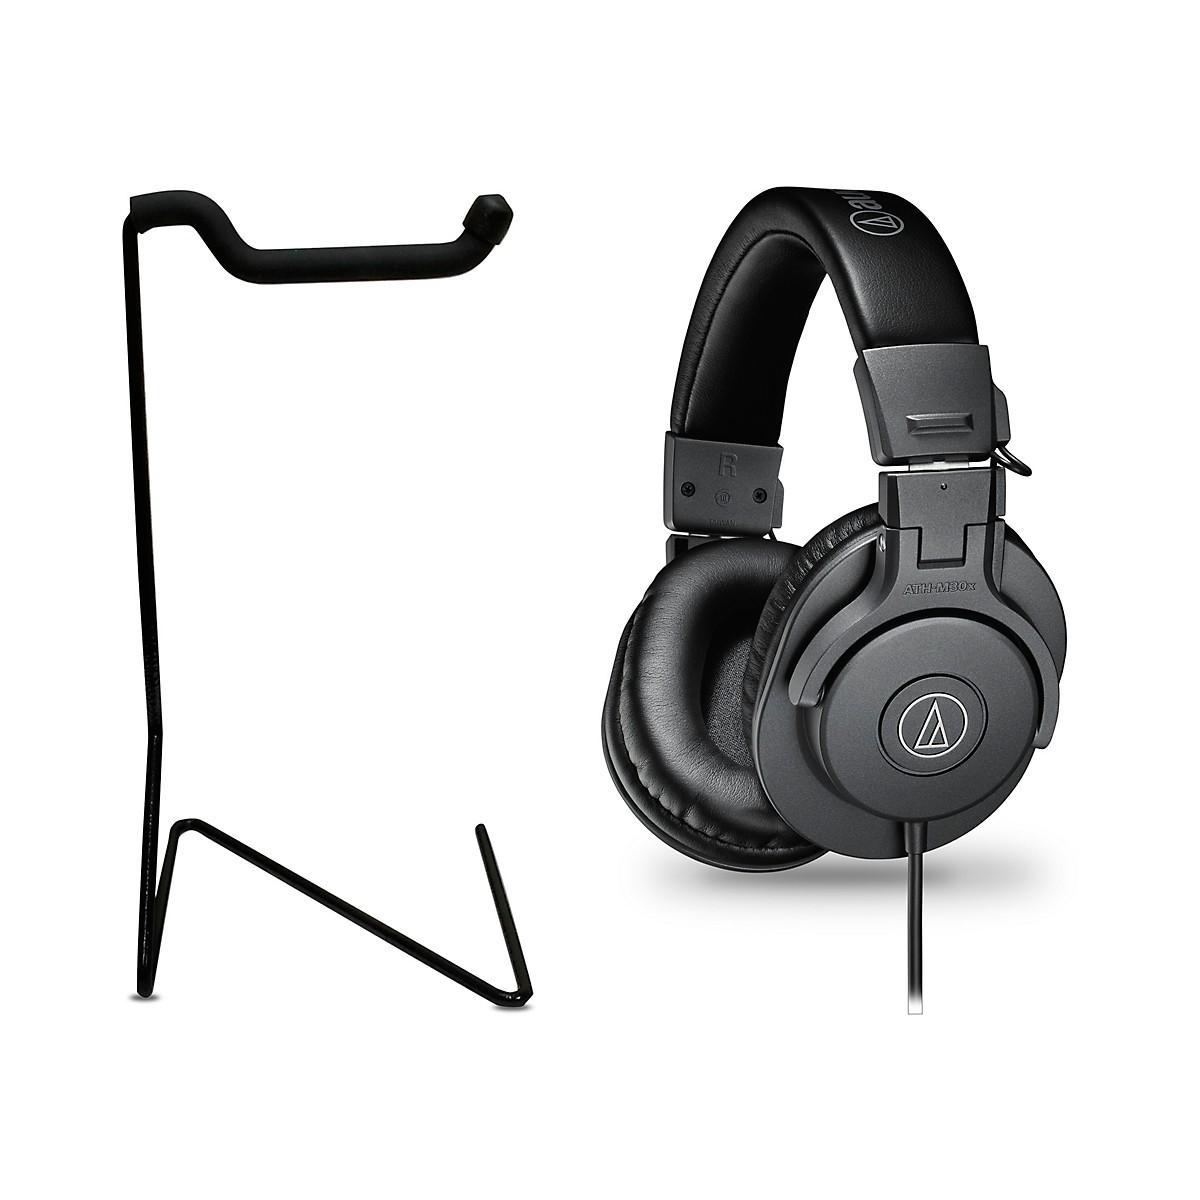 Audio-Technica ATH-M30x Studio Monitor Headphones with Stand